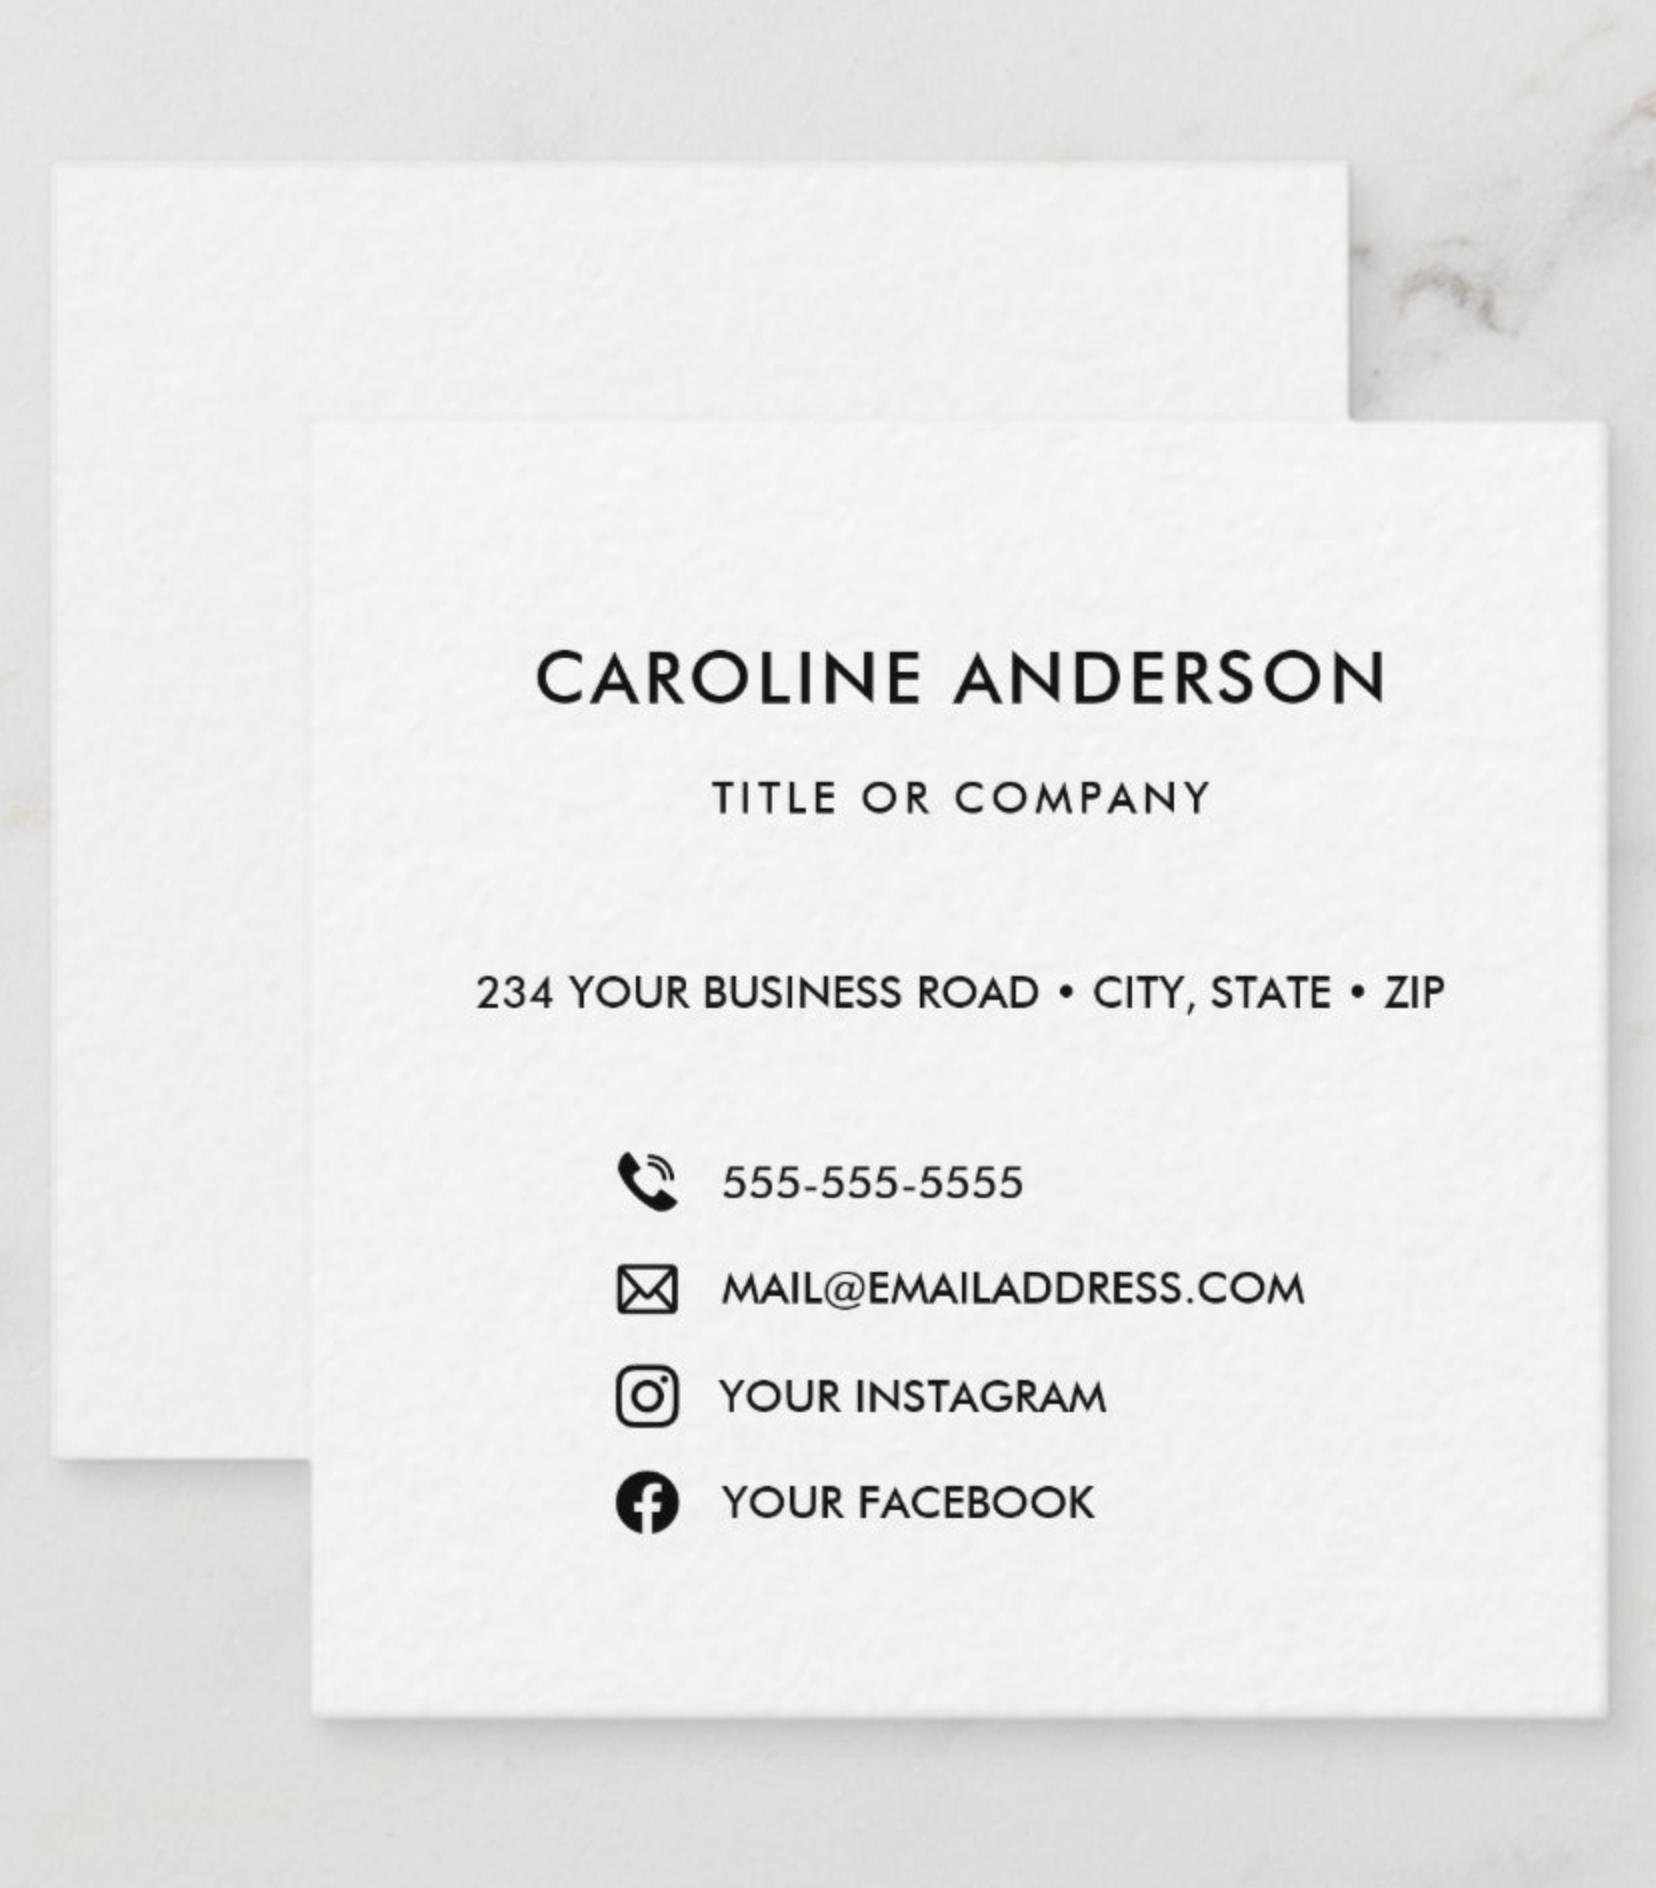 Custom Logo Social Media Icons Networking Square Business Card Zazzle Com Square Business Cards Square Business Card Professional Business Cards